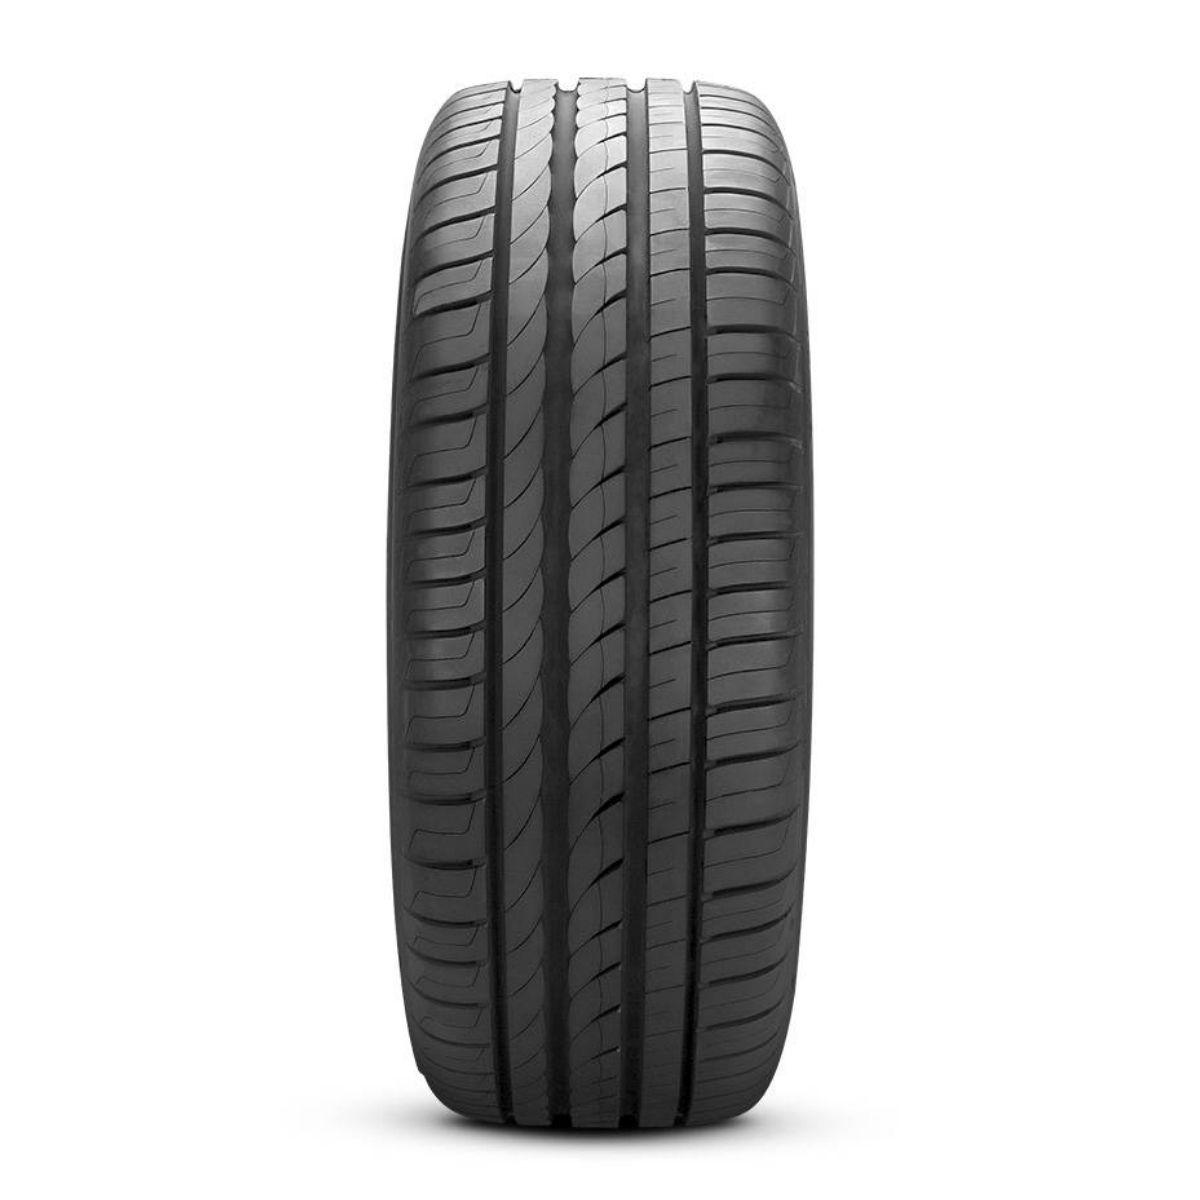 Pneu Pirelli Cinturato P7 Aro 16 205/55 91V